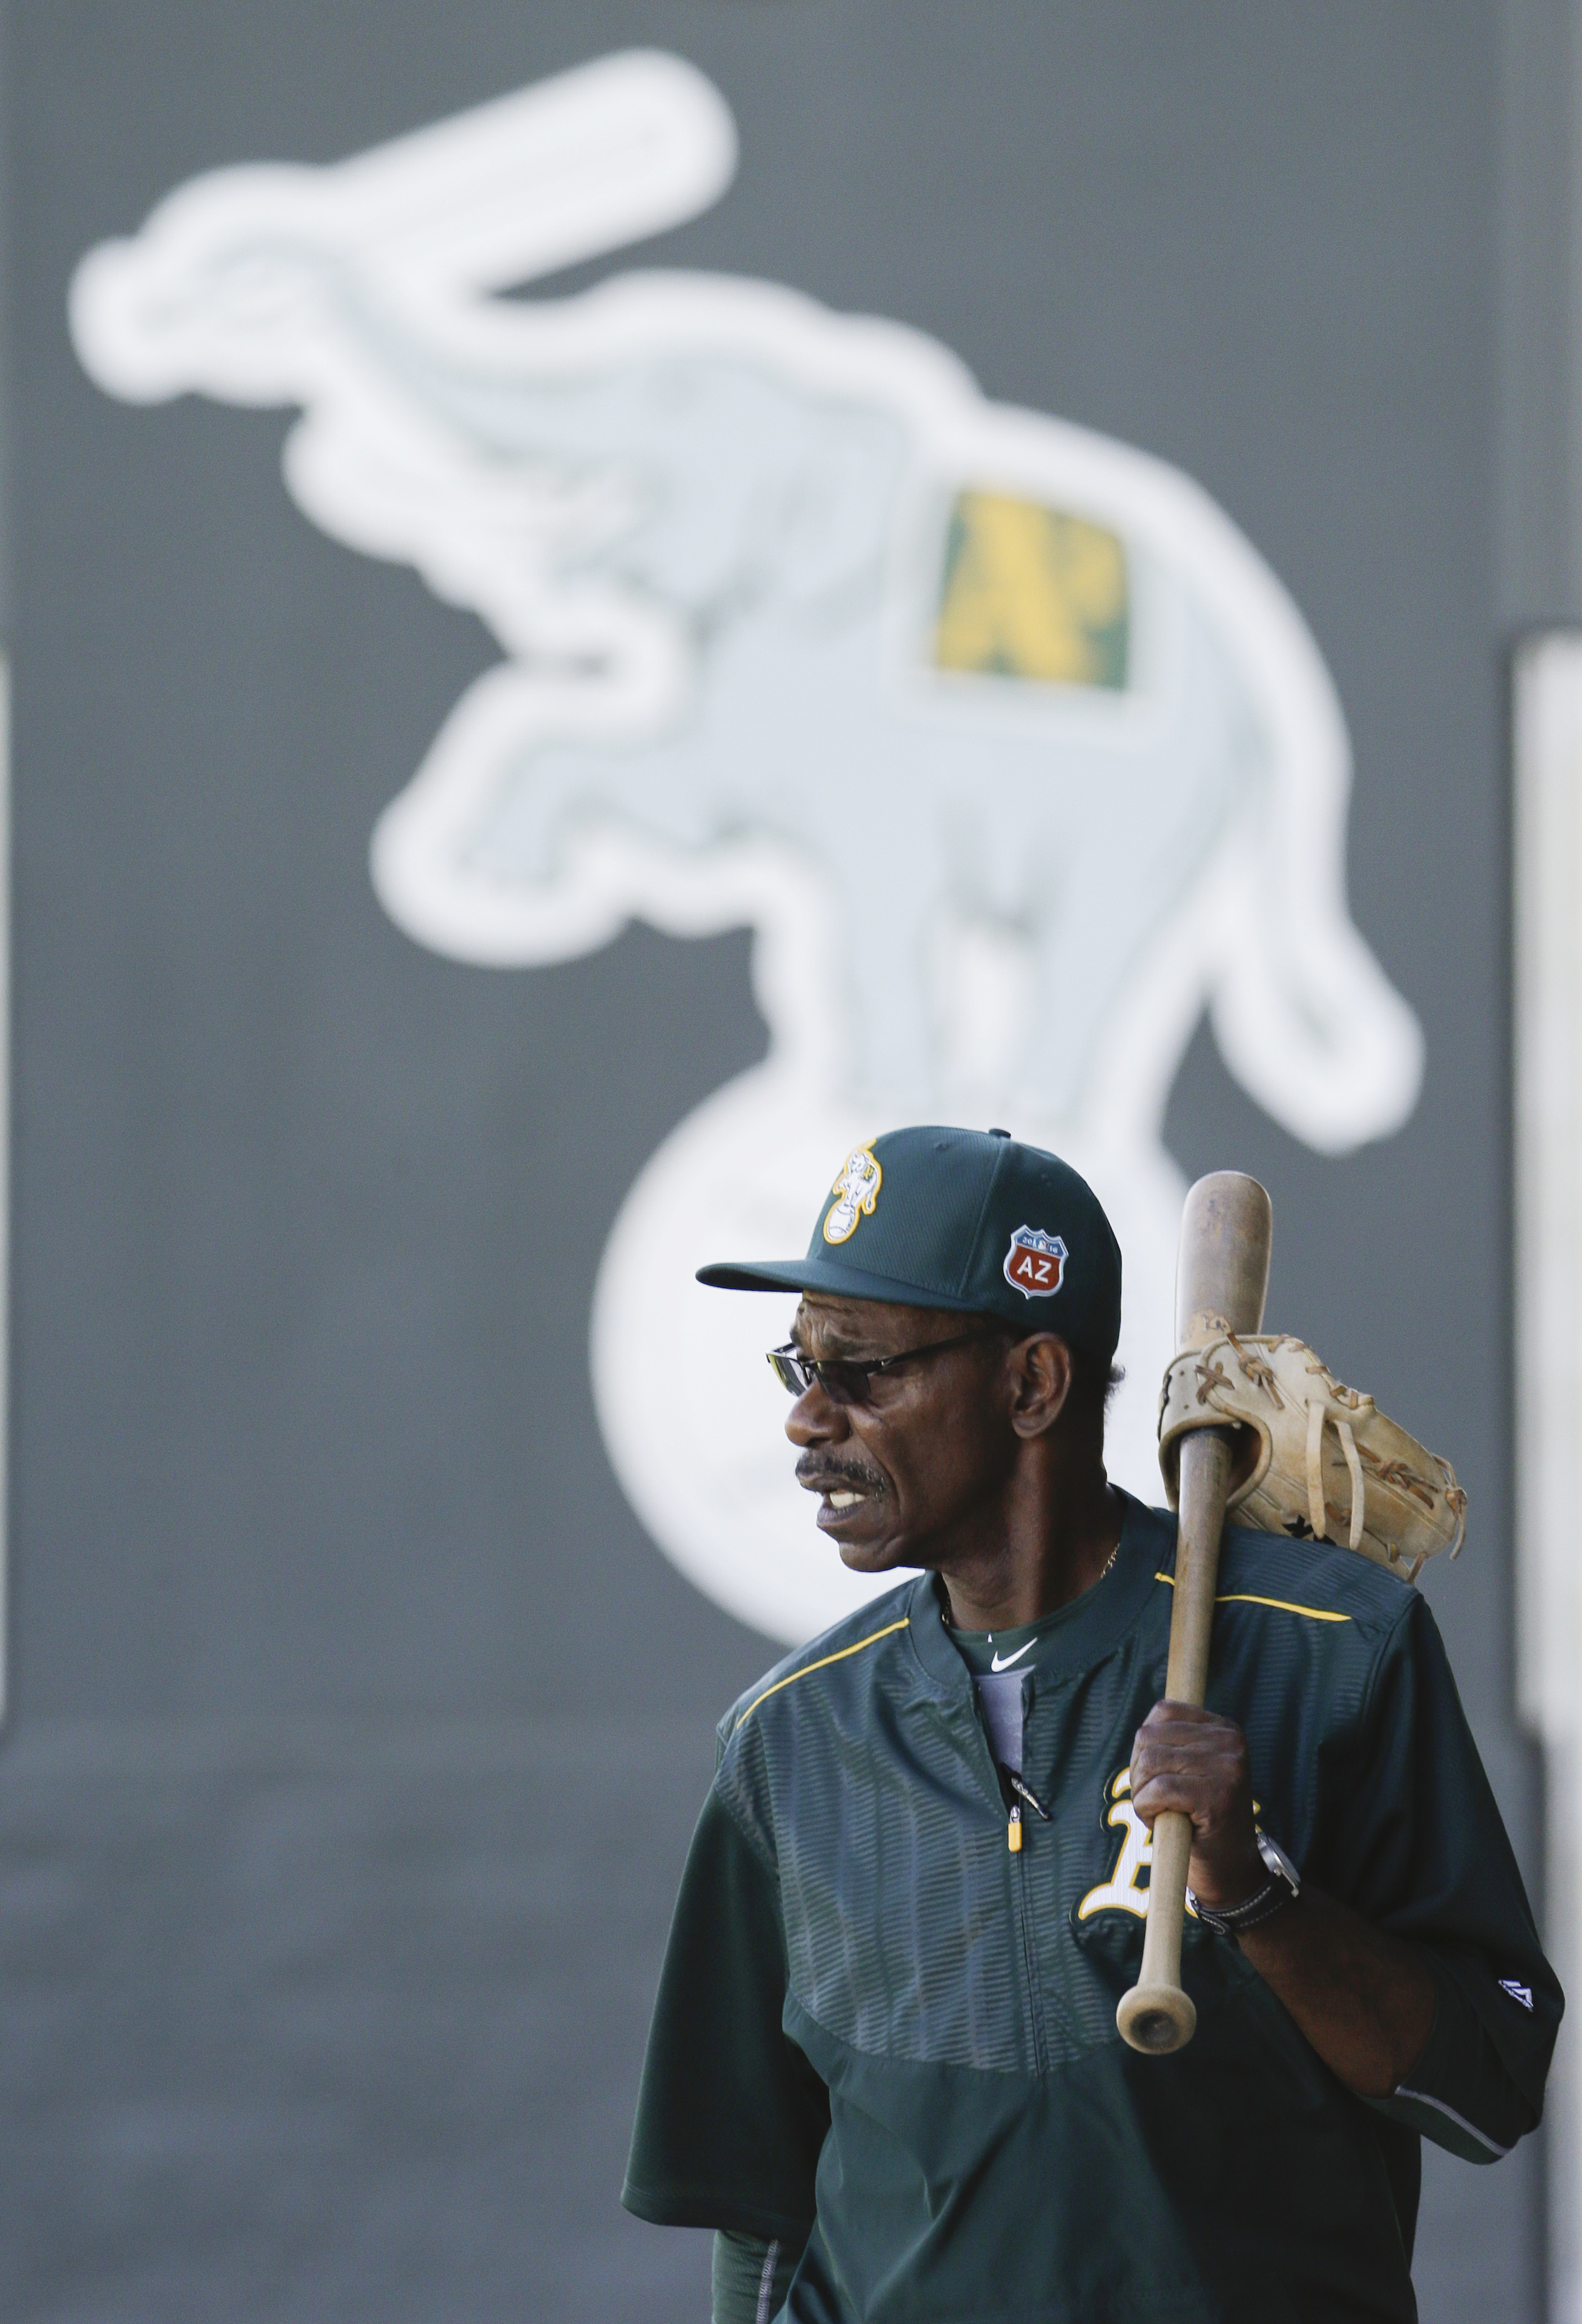 Oakland Athletics third base coach Ron Washington arrives for spring training baseball practice in Mesa, Ariz., Sunday, Feb. 21, 2016. (AP Photo/Chris Carlson)